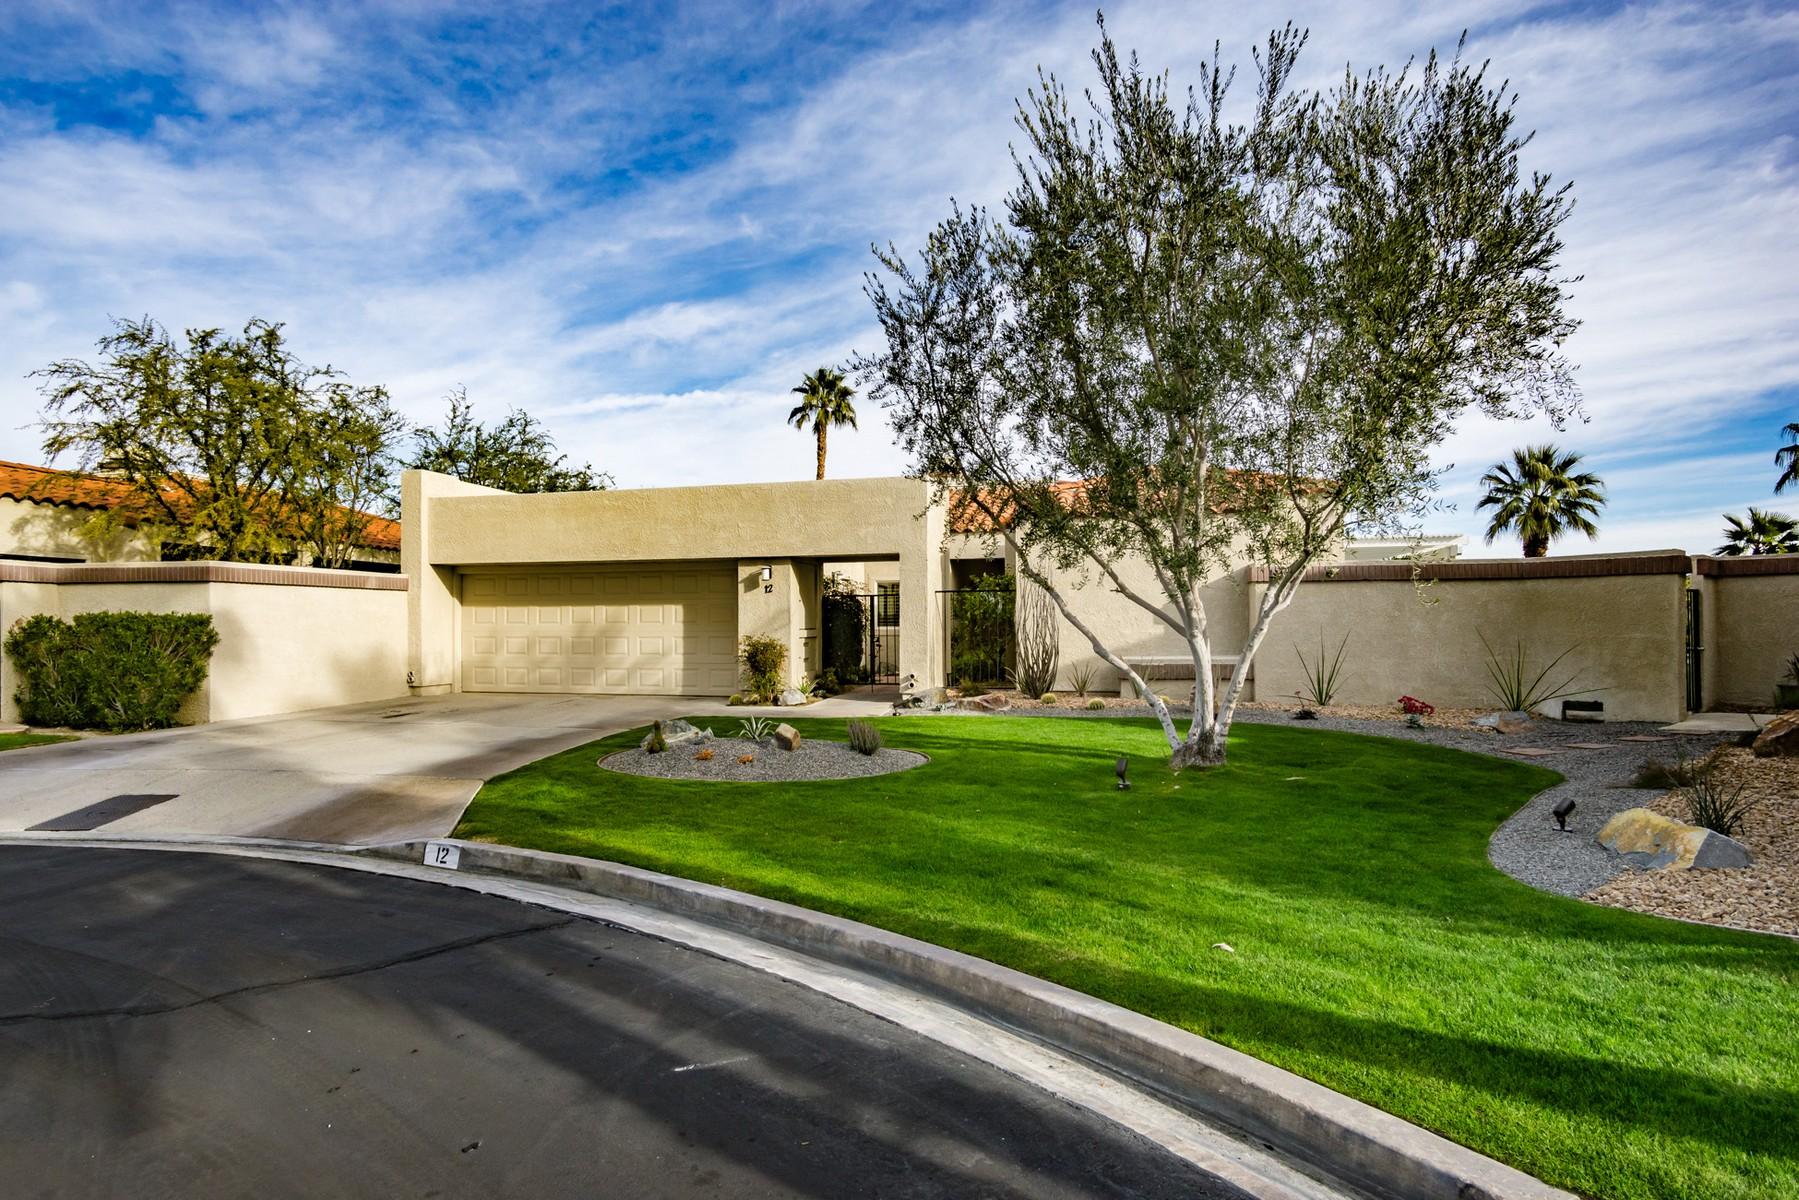 Single Family Home for Sale at 12 Vista Loma Drive Rancho Mirage, California 92270 United States